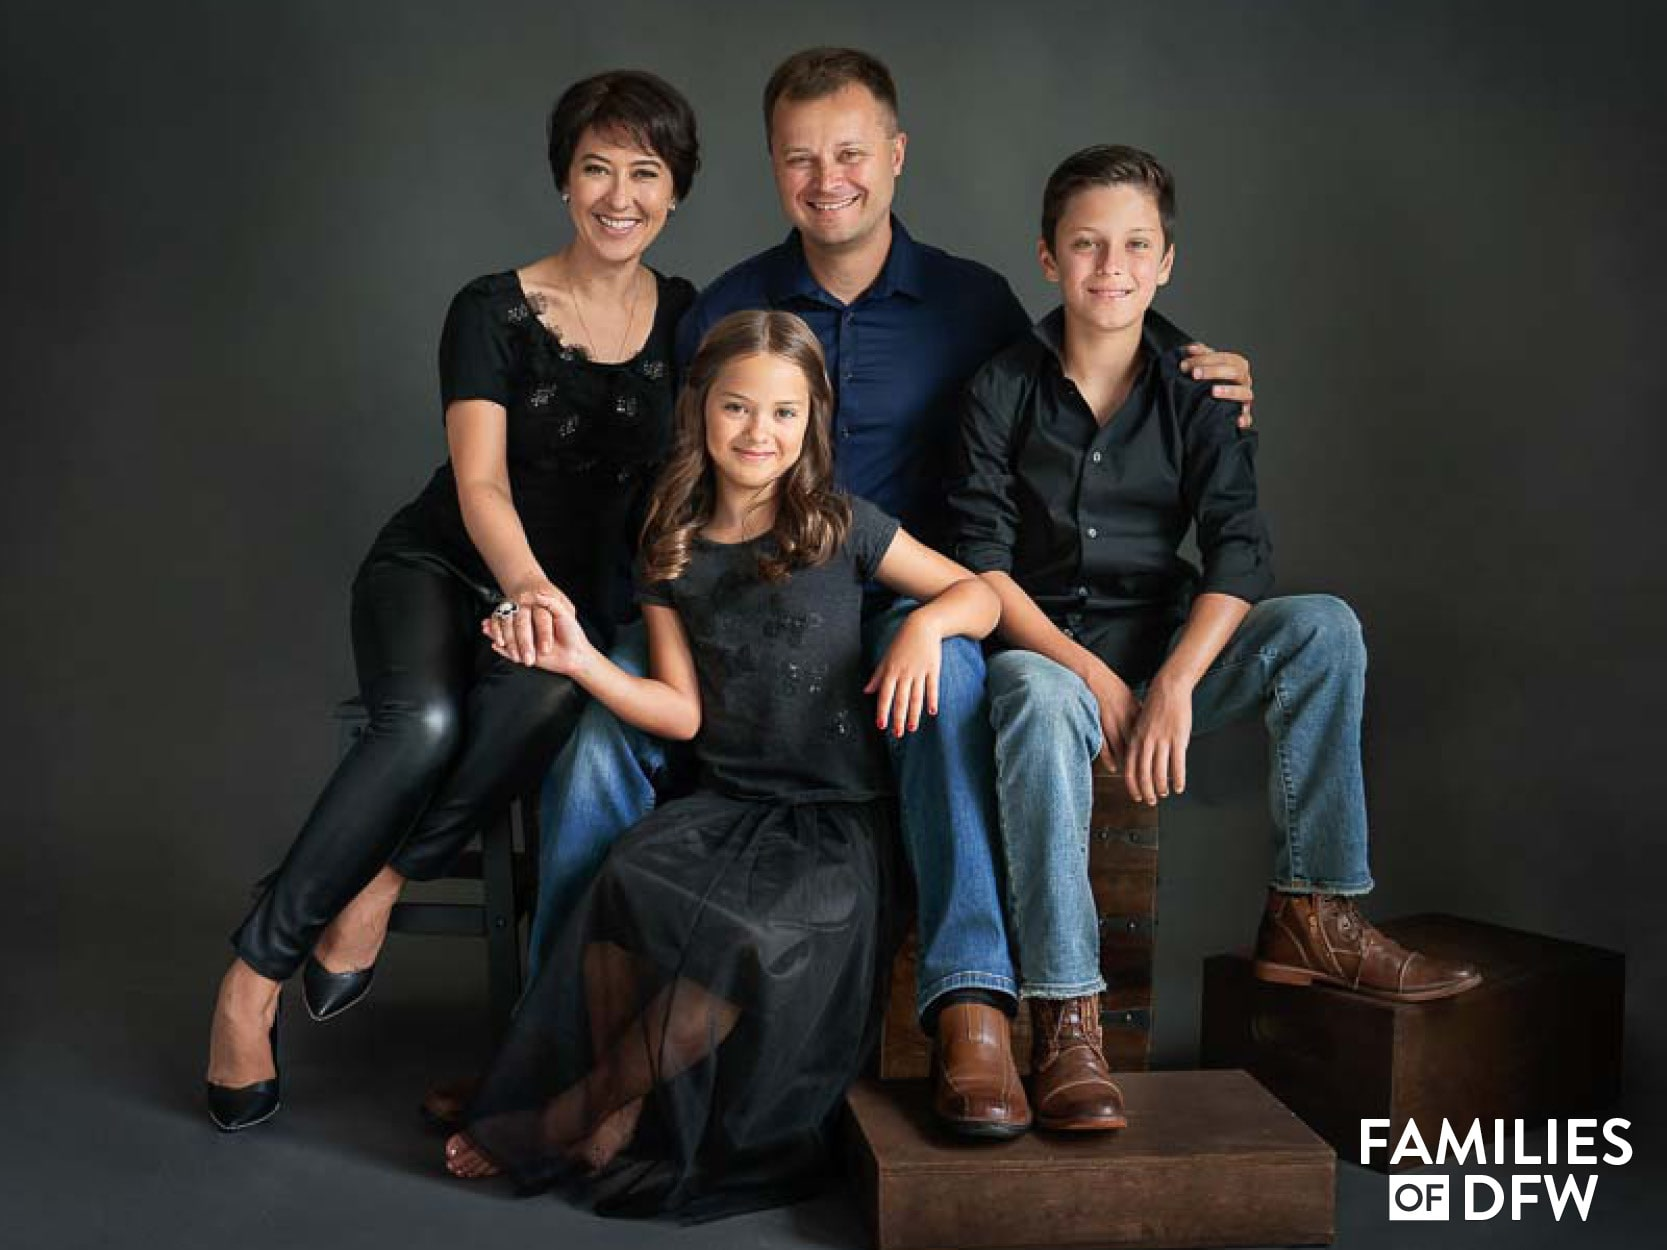 Tatiana Morosyuk and her family